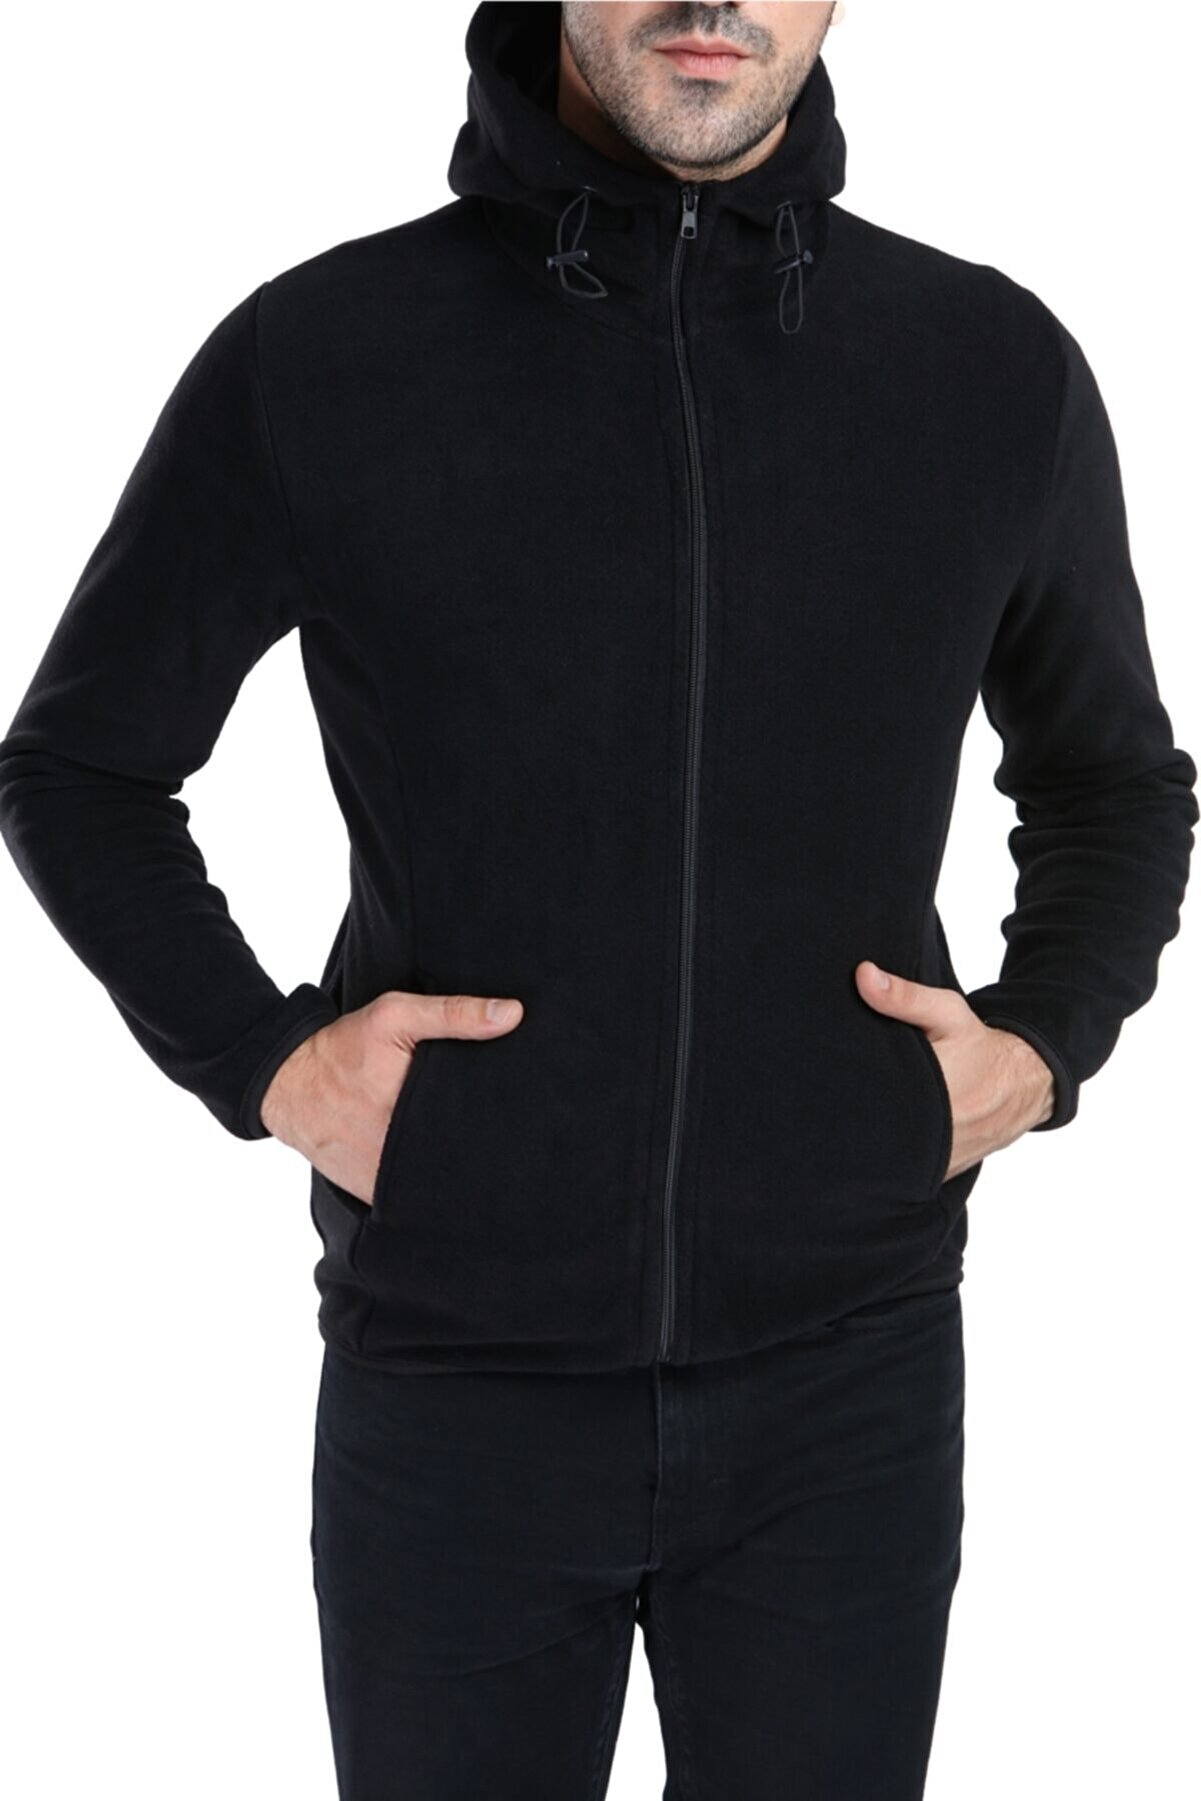 Ghassy Co Erkek Siyah Kapüşonlu Polar Ceket